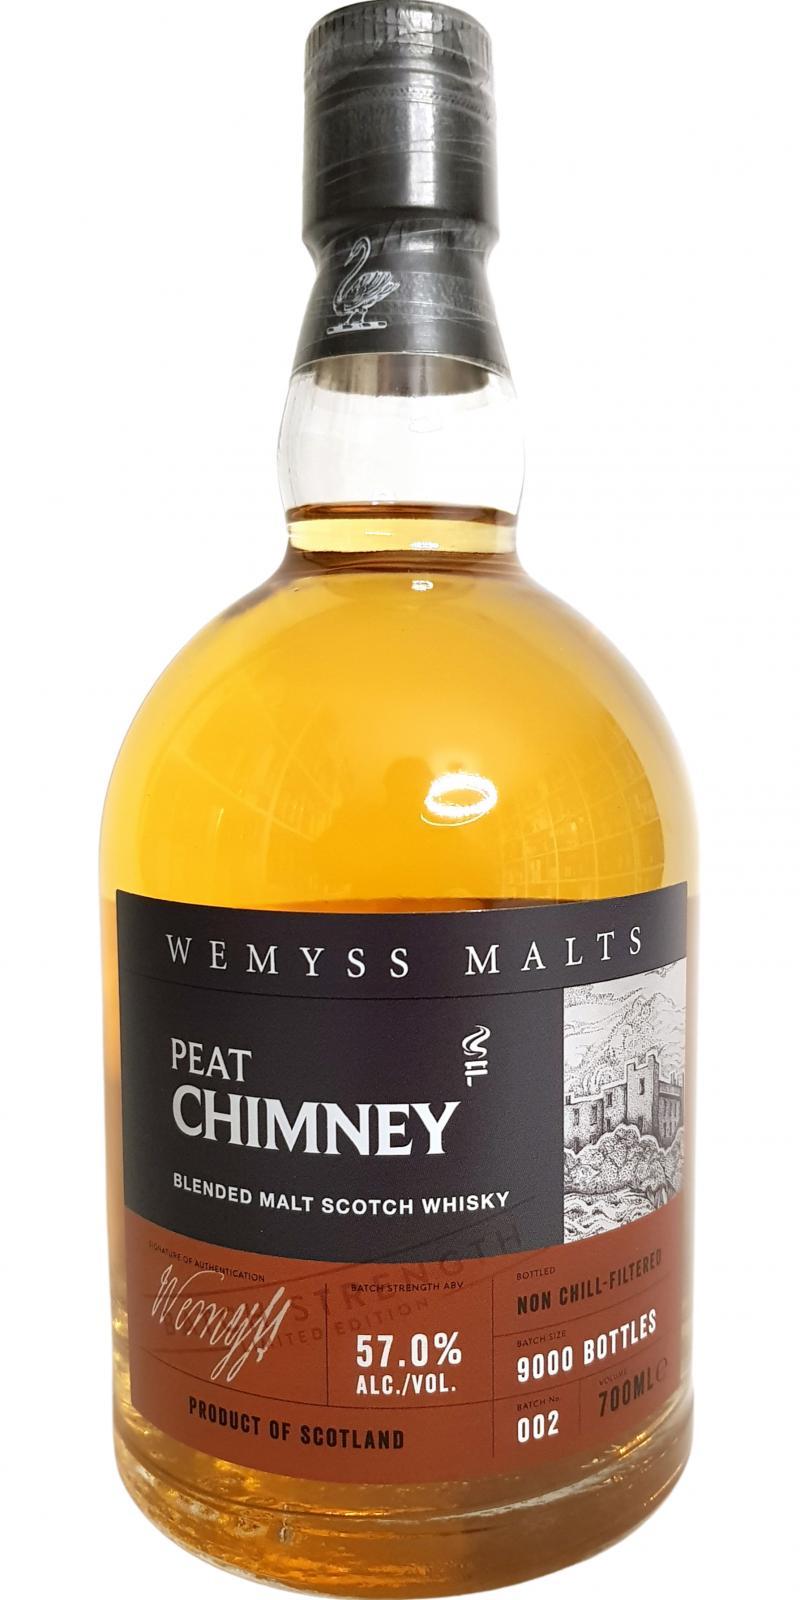 Peat Chimney Batch Strength 002 Wy